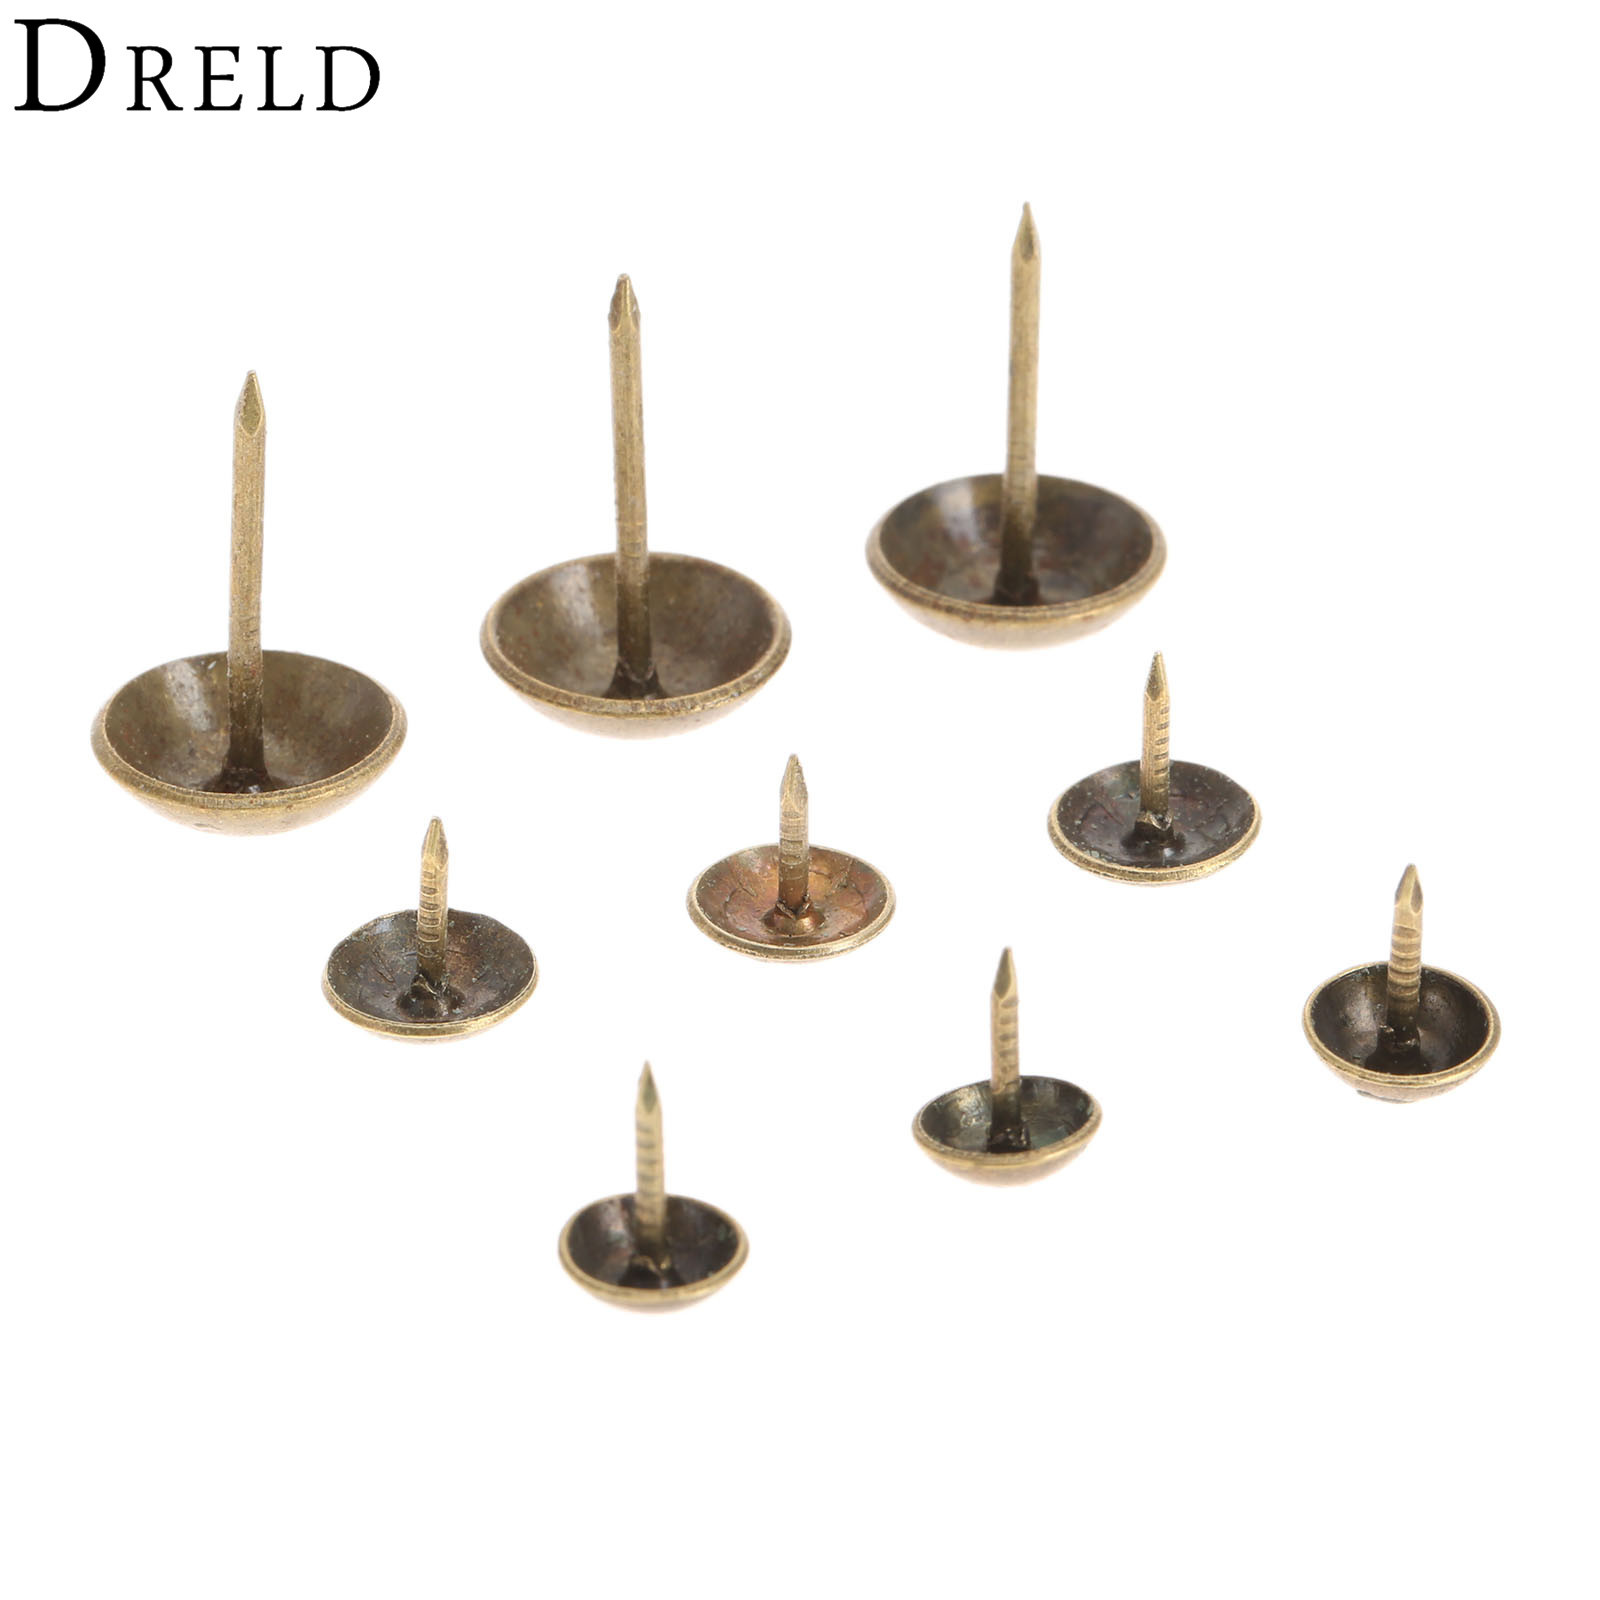 Upholstery Nails Tacks 22mm Head Dia Round Thumb Push Pins Copper Tone 30 Pcs